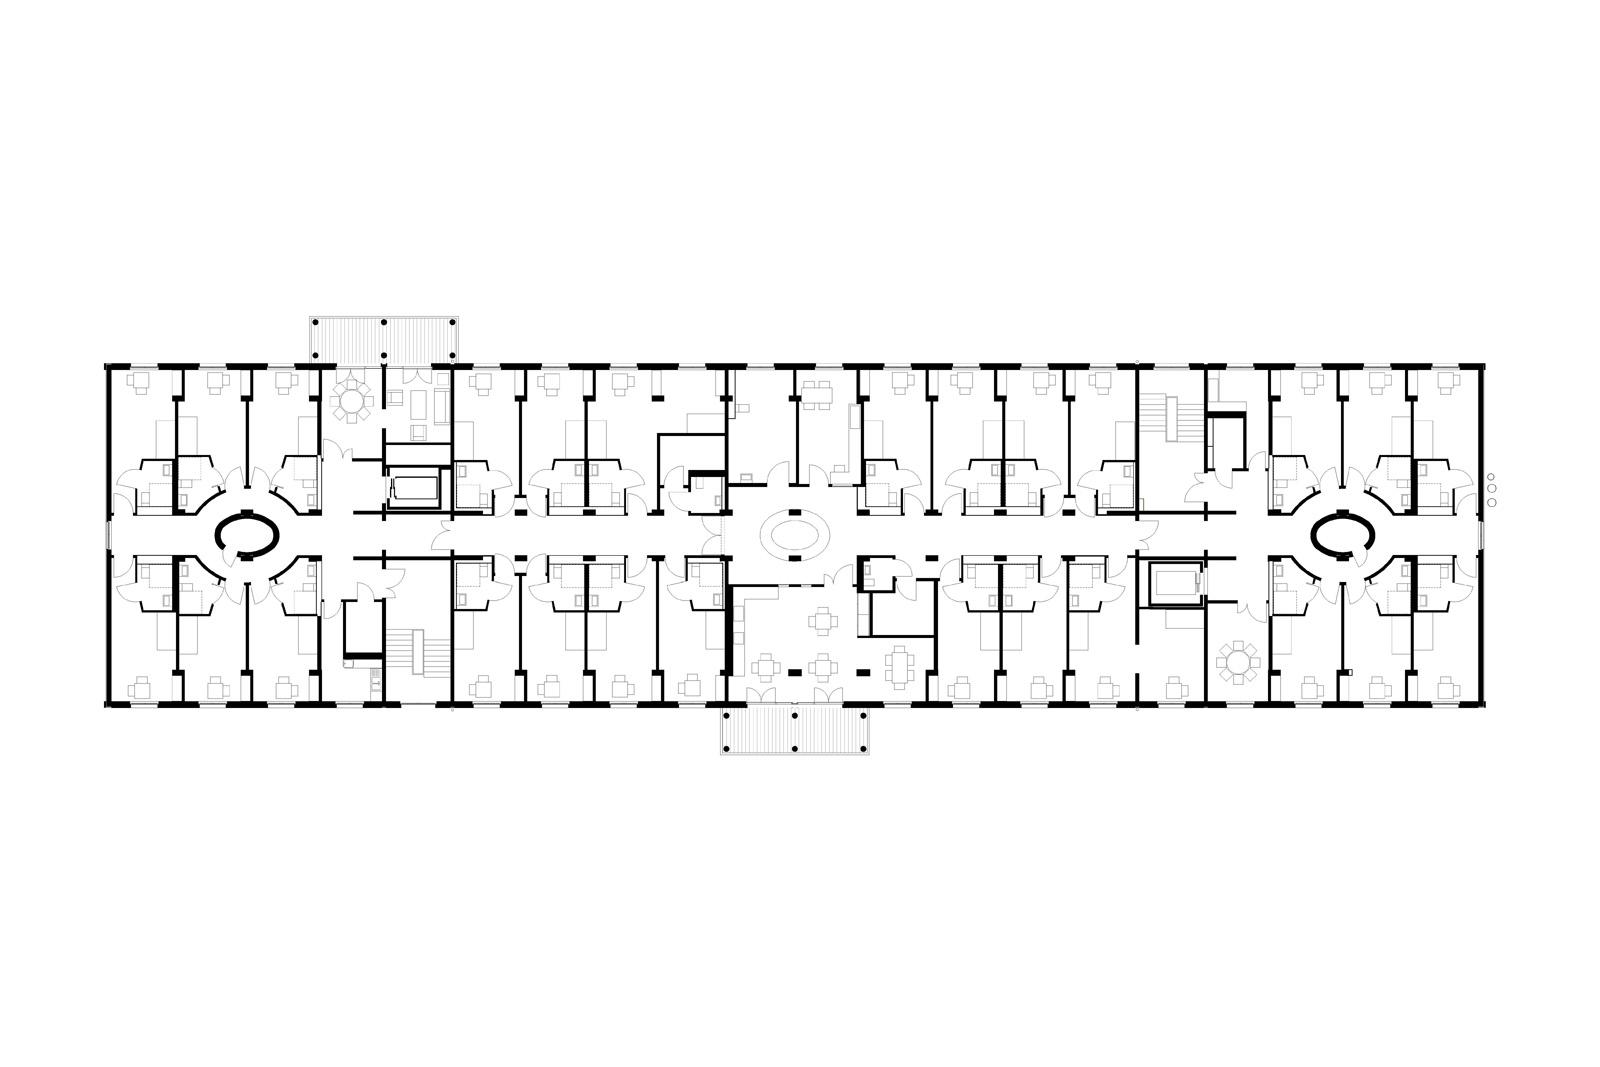 img-5499